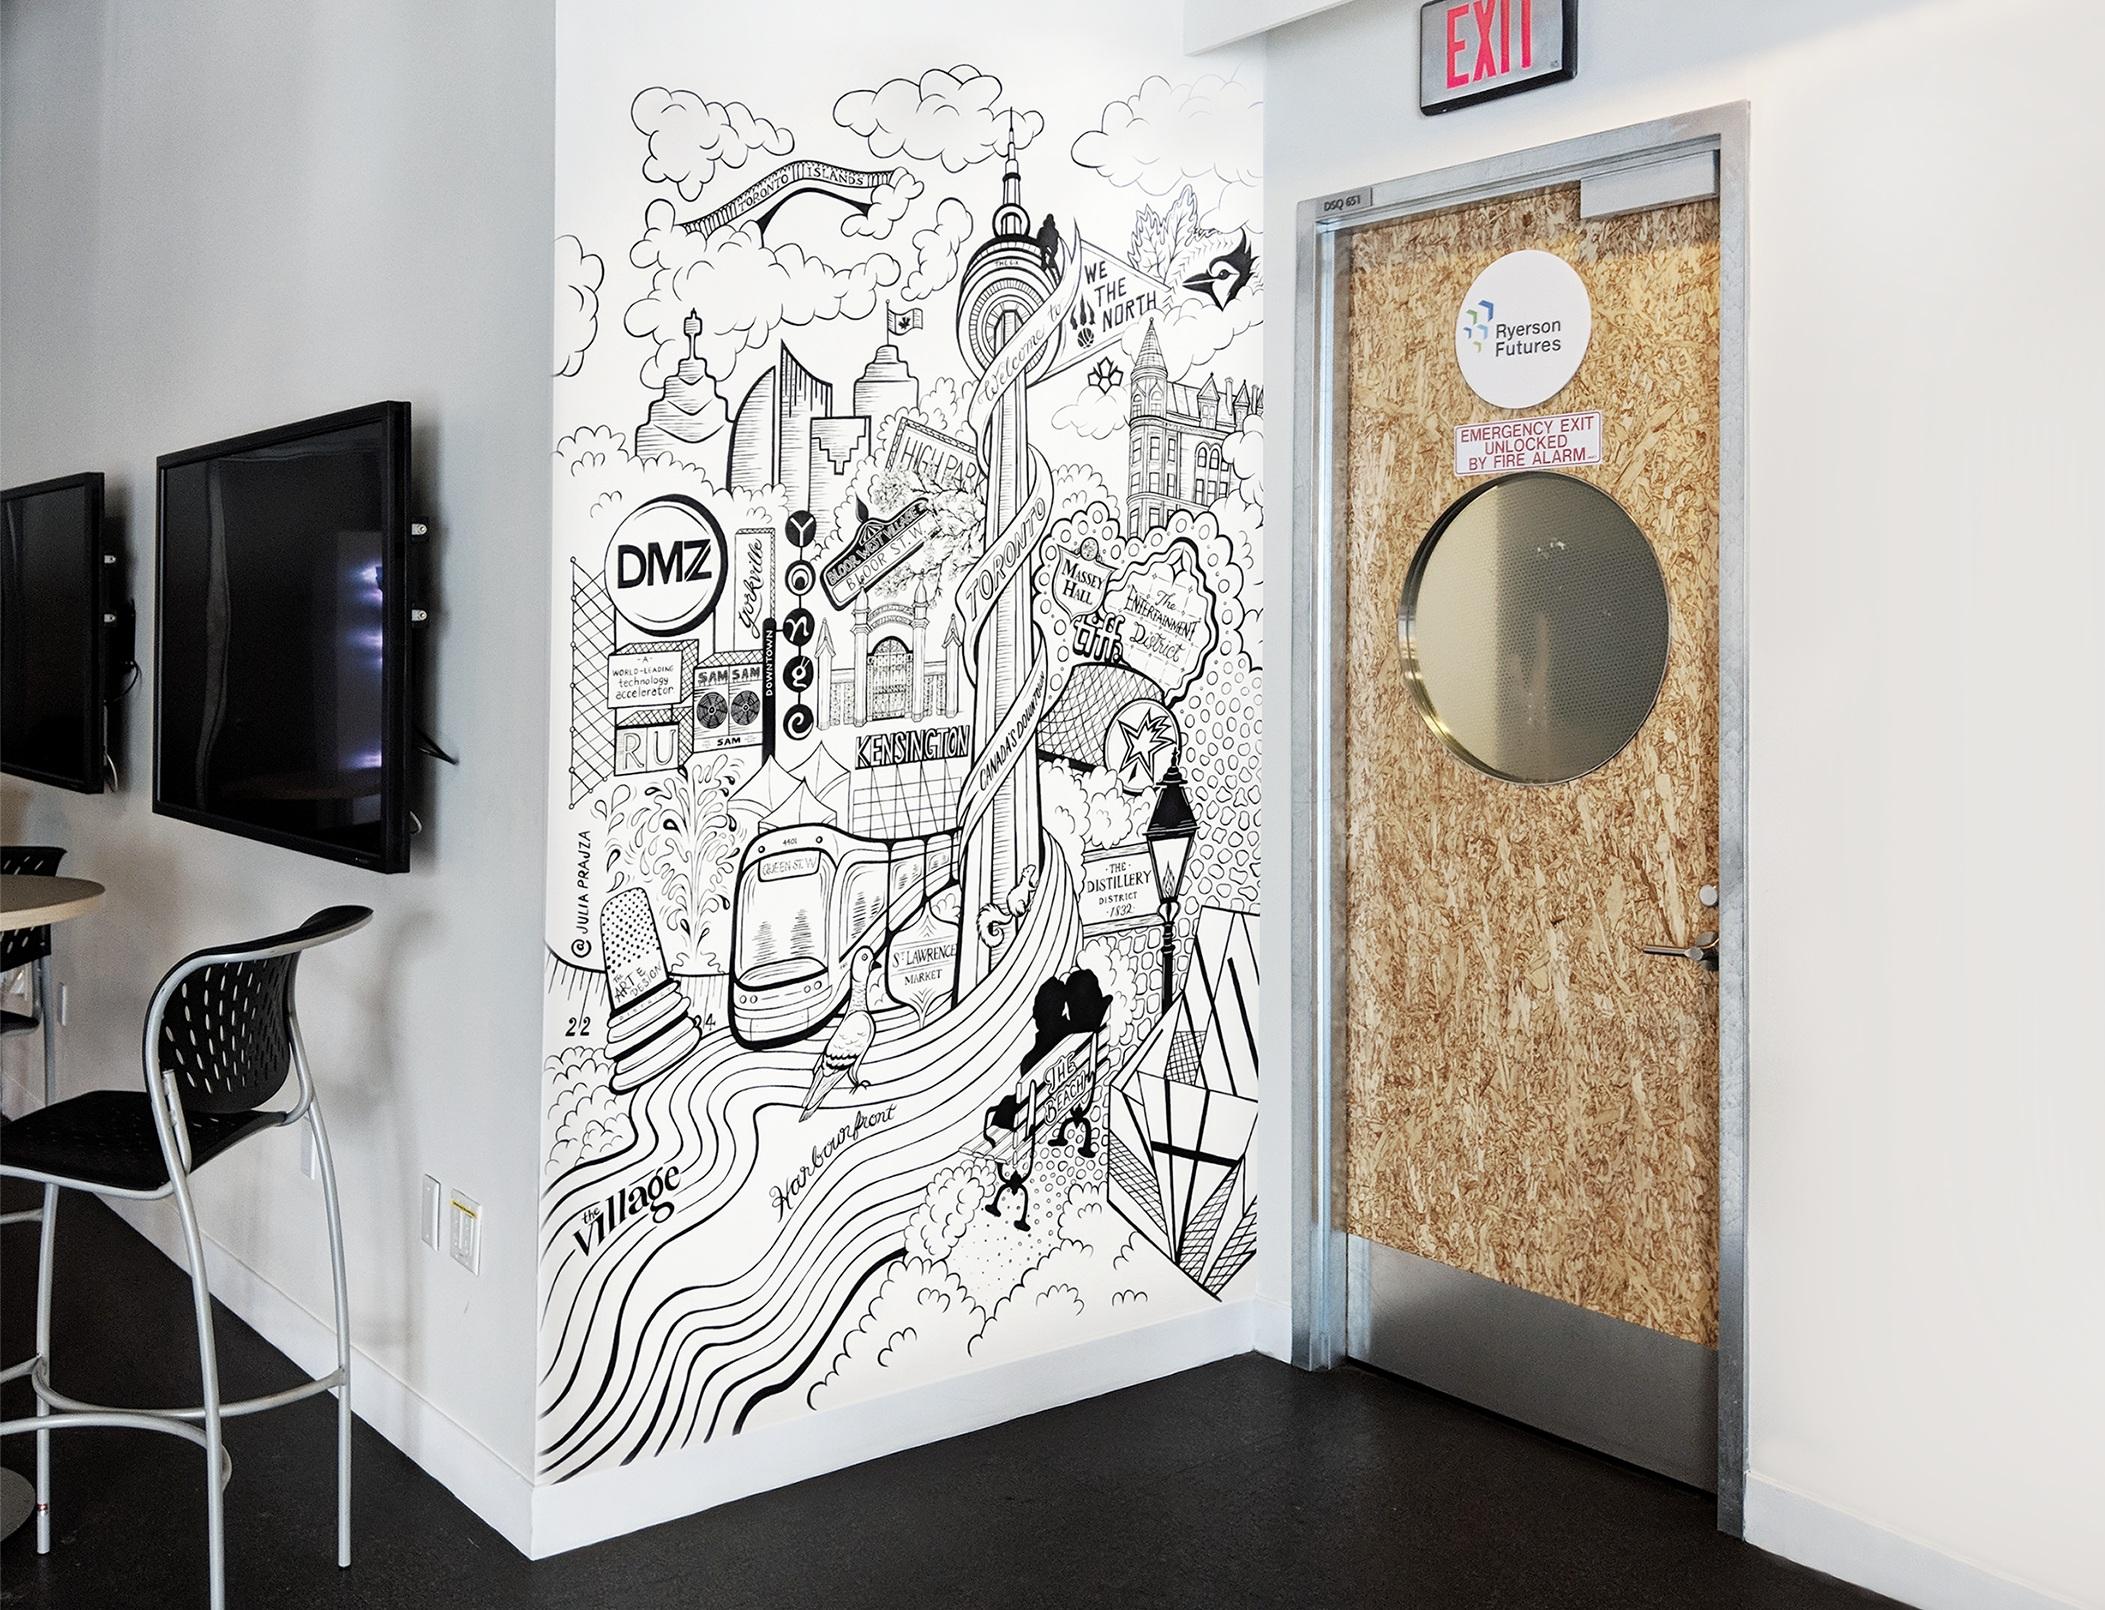 DMZ-mural+edit+copy+copy-small.jpg